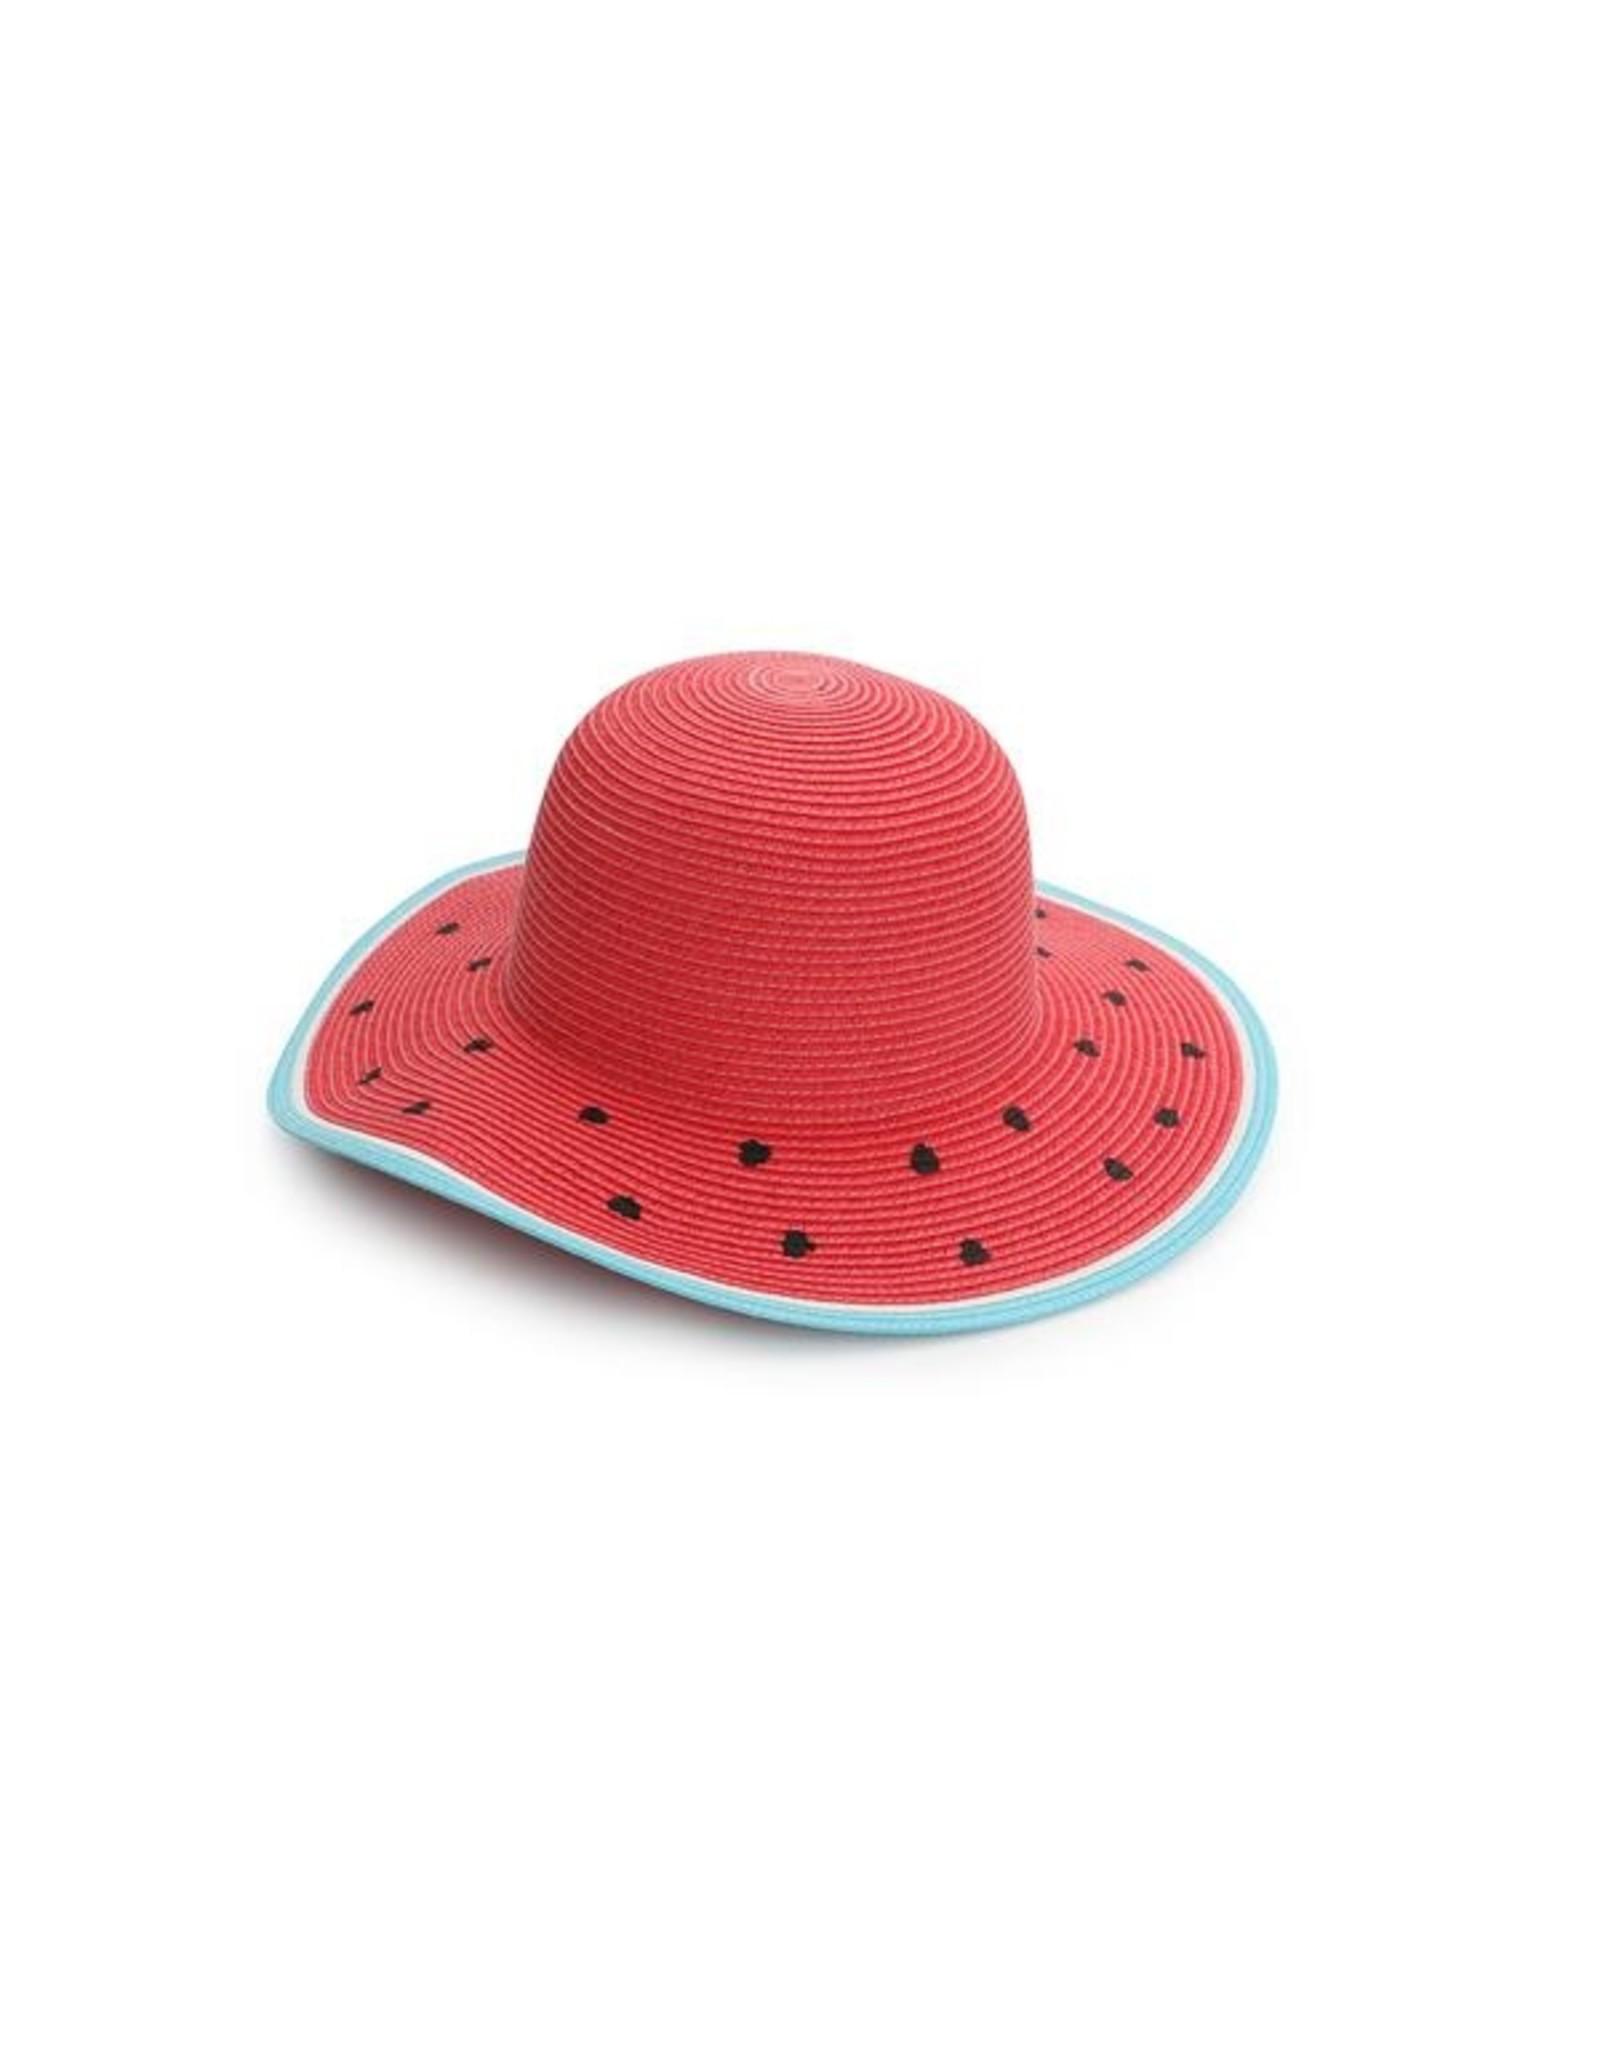 FLAPJACK FLAPJACK- KIDS STRAW HATS